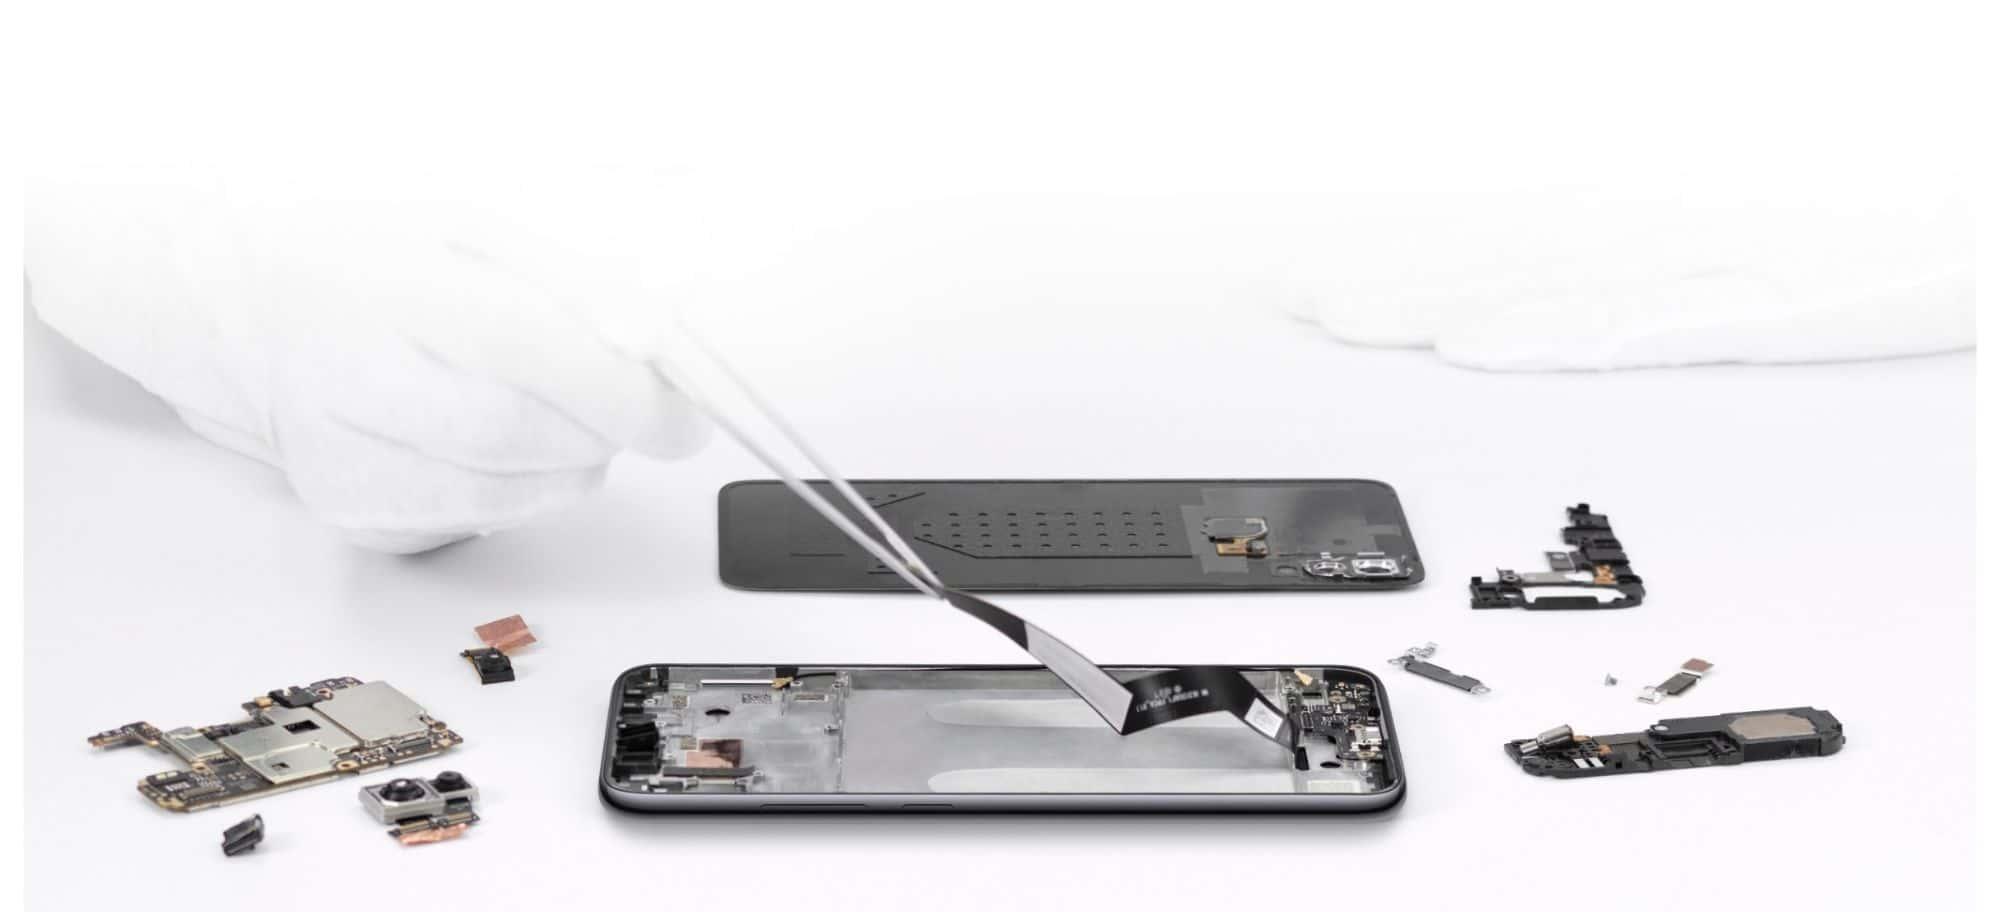 Xiaomi Redmi Note 7 64 Go (RAM 4 Go) Dual SIM Noir cosmique image 9   Rakuten